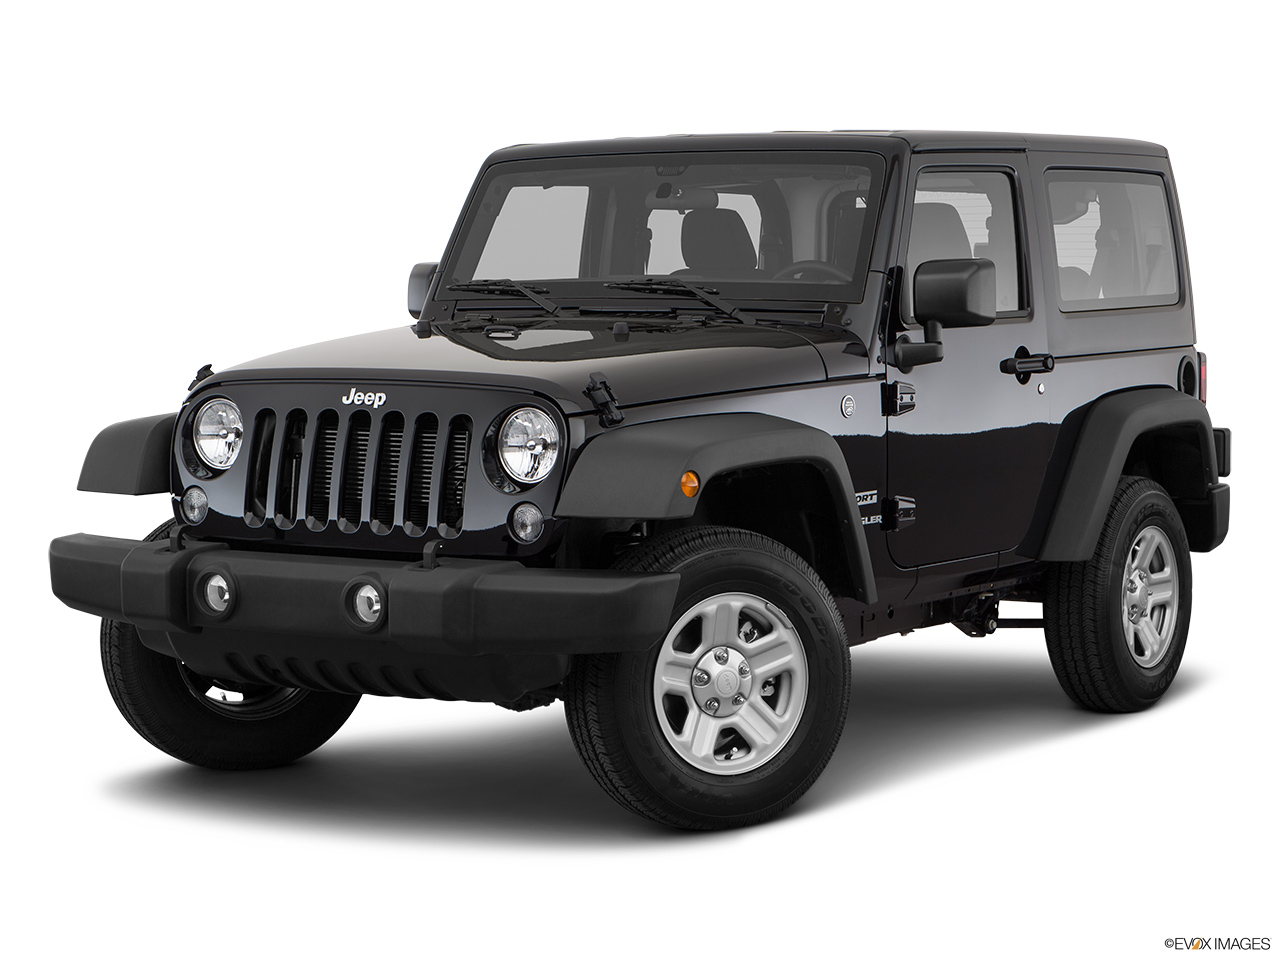 car pictures list for jeep wrangler 2017 willys wheeler 3. Black Bedroom Furniture Sets. Home Design Ideas